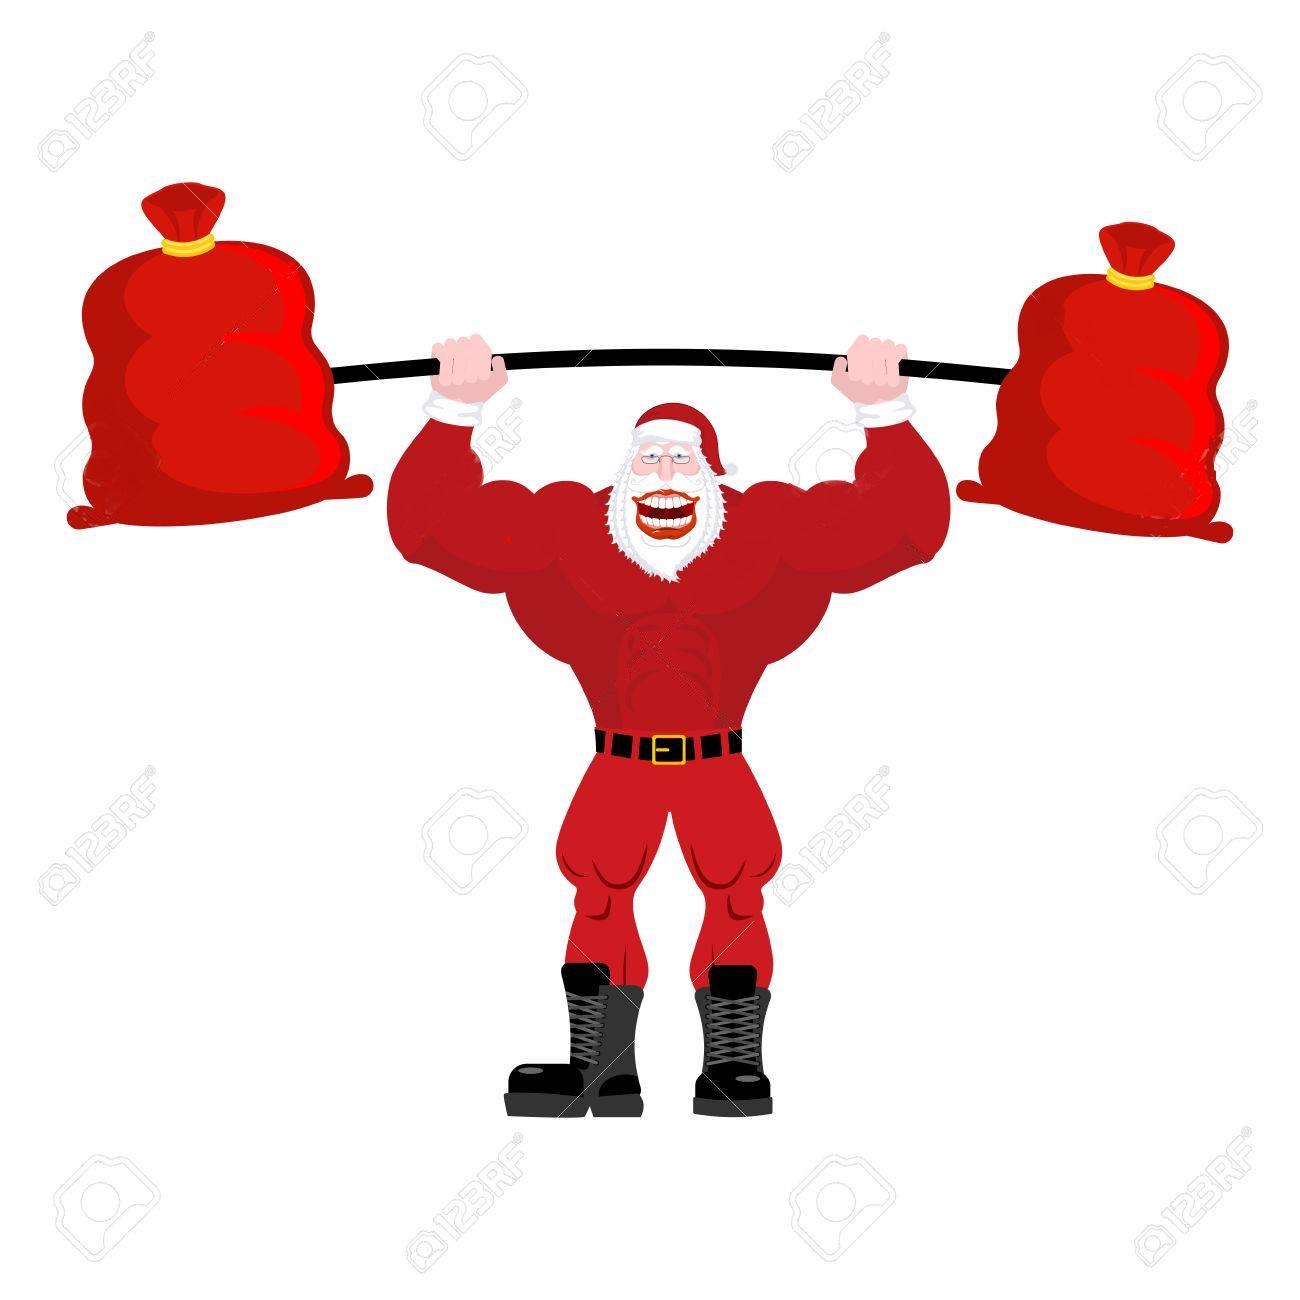 Santa lifts.jpg